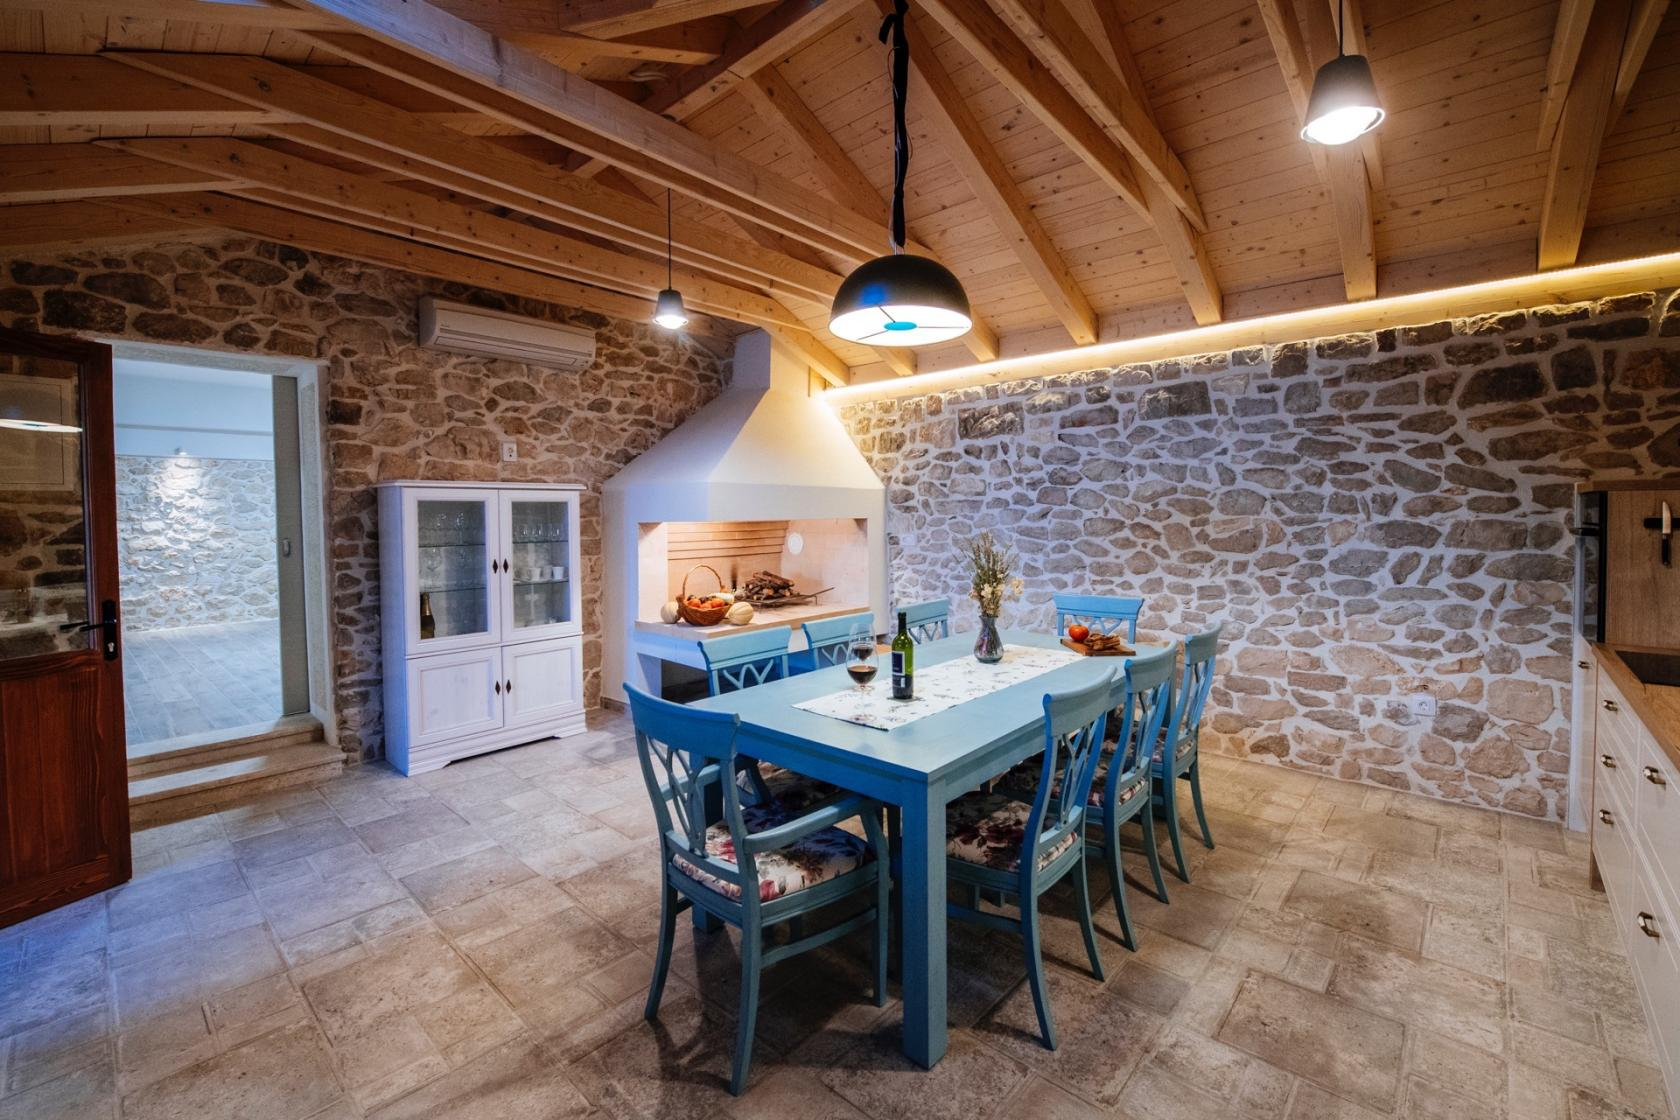 villa, bandela, rustic, stone, zadar, croatia, www.zadarvillas,com